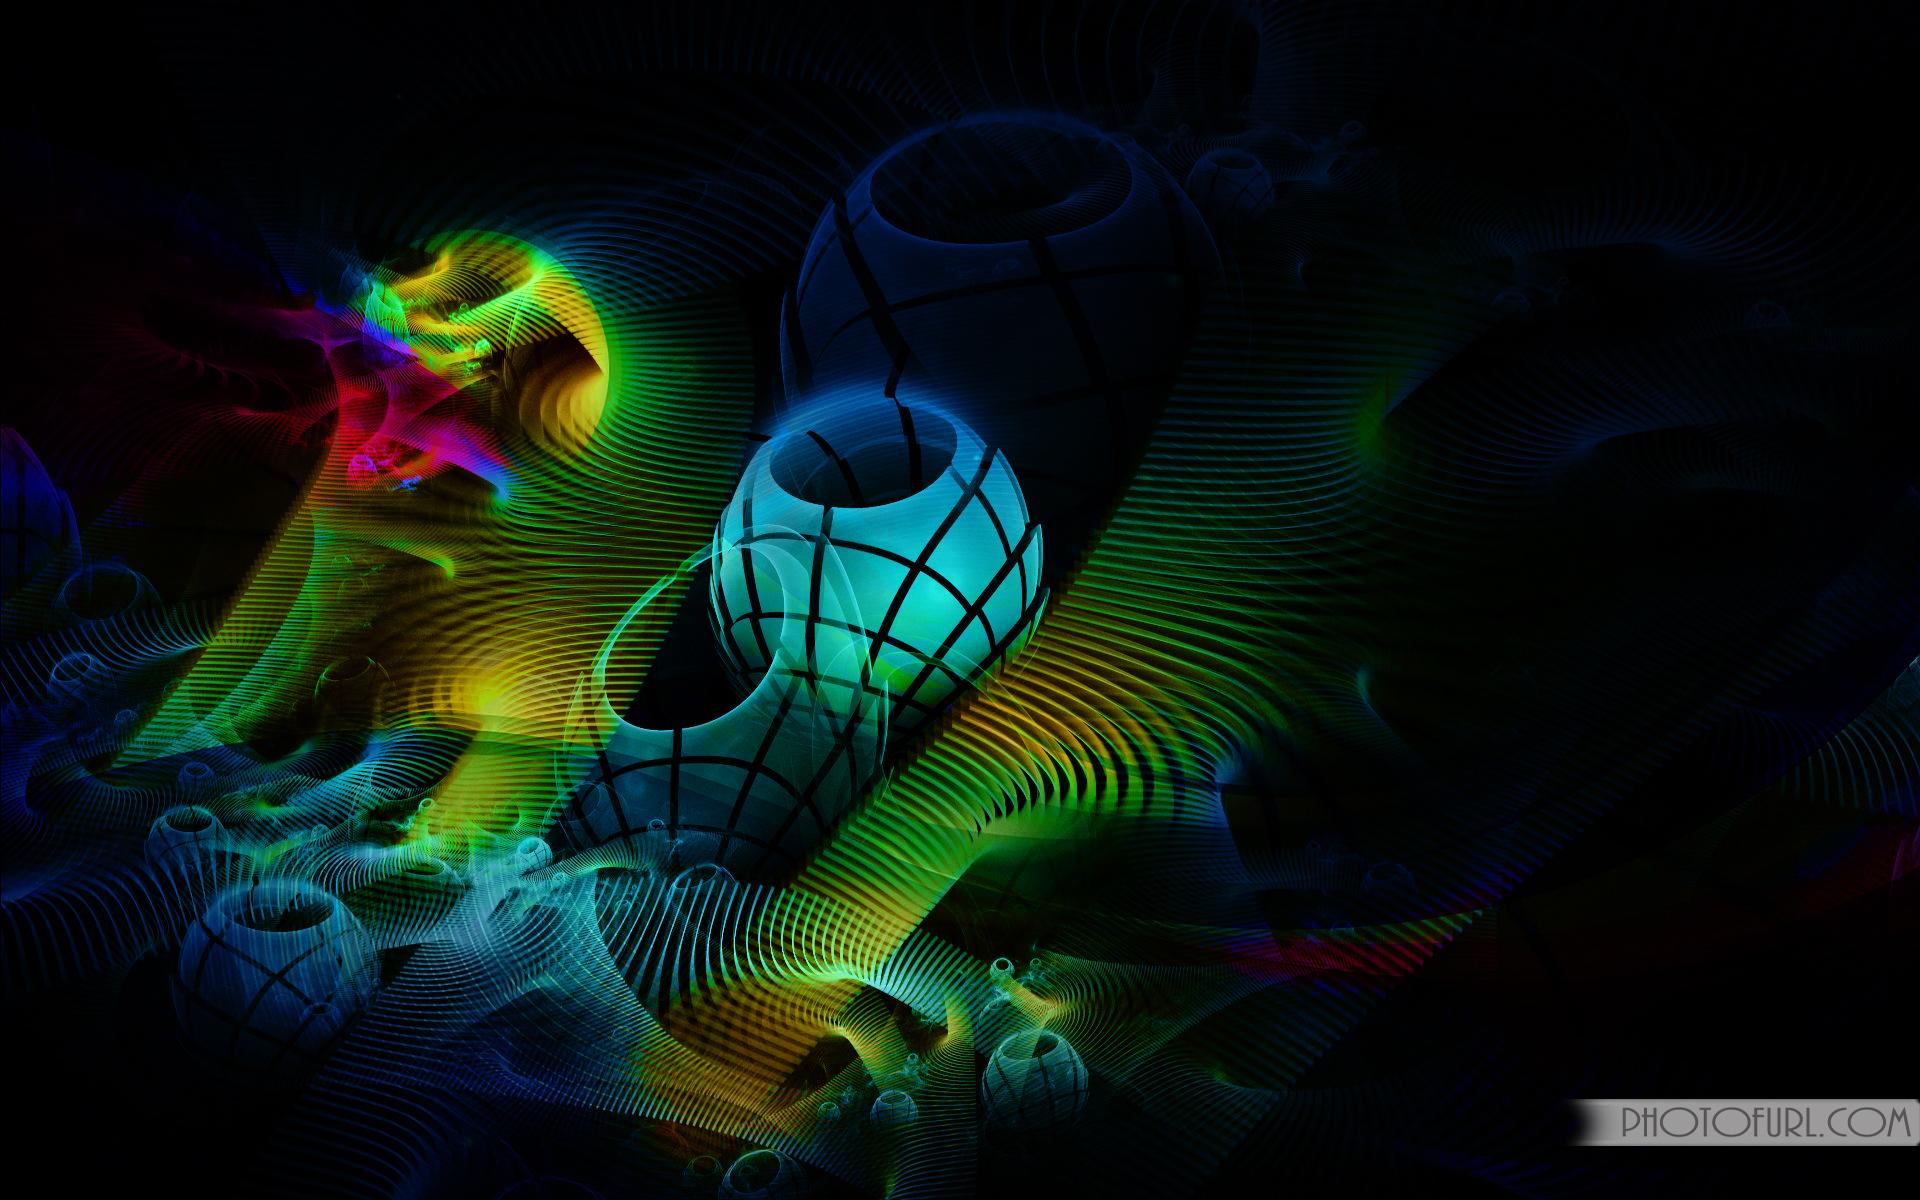 feedionet3d fantasy digital graphic art wallpaper free wallpapers 1920x1200